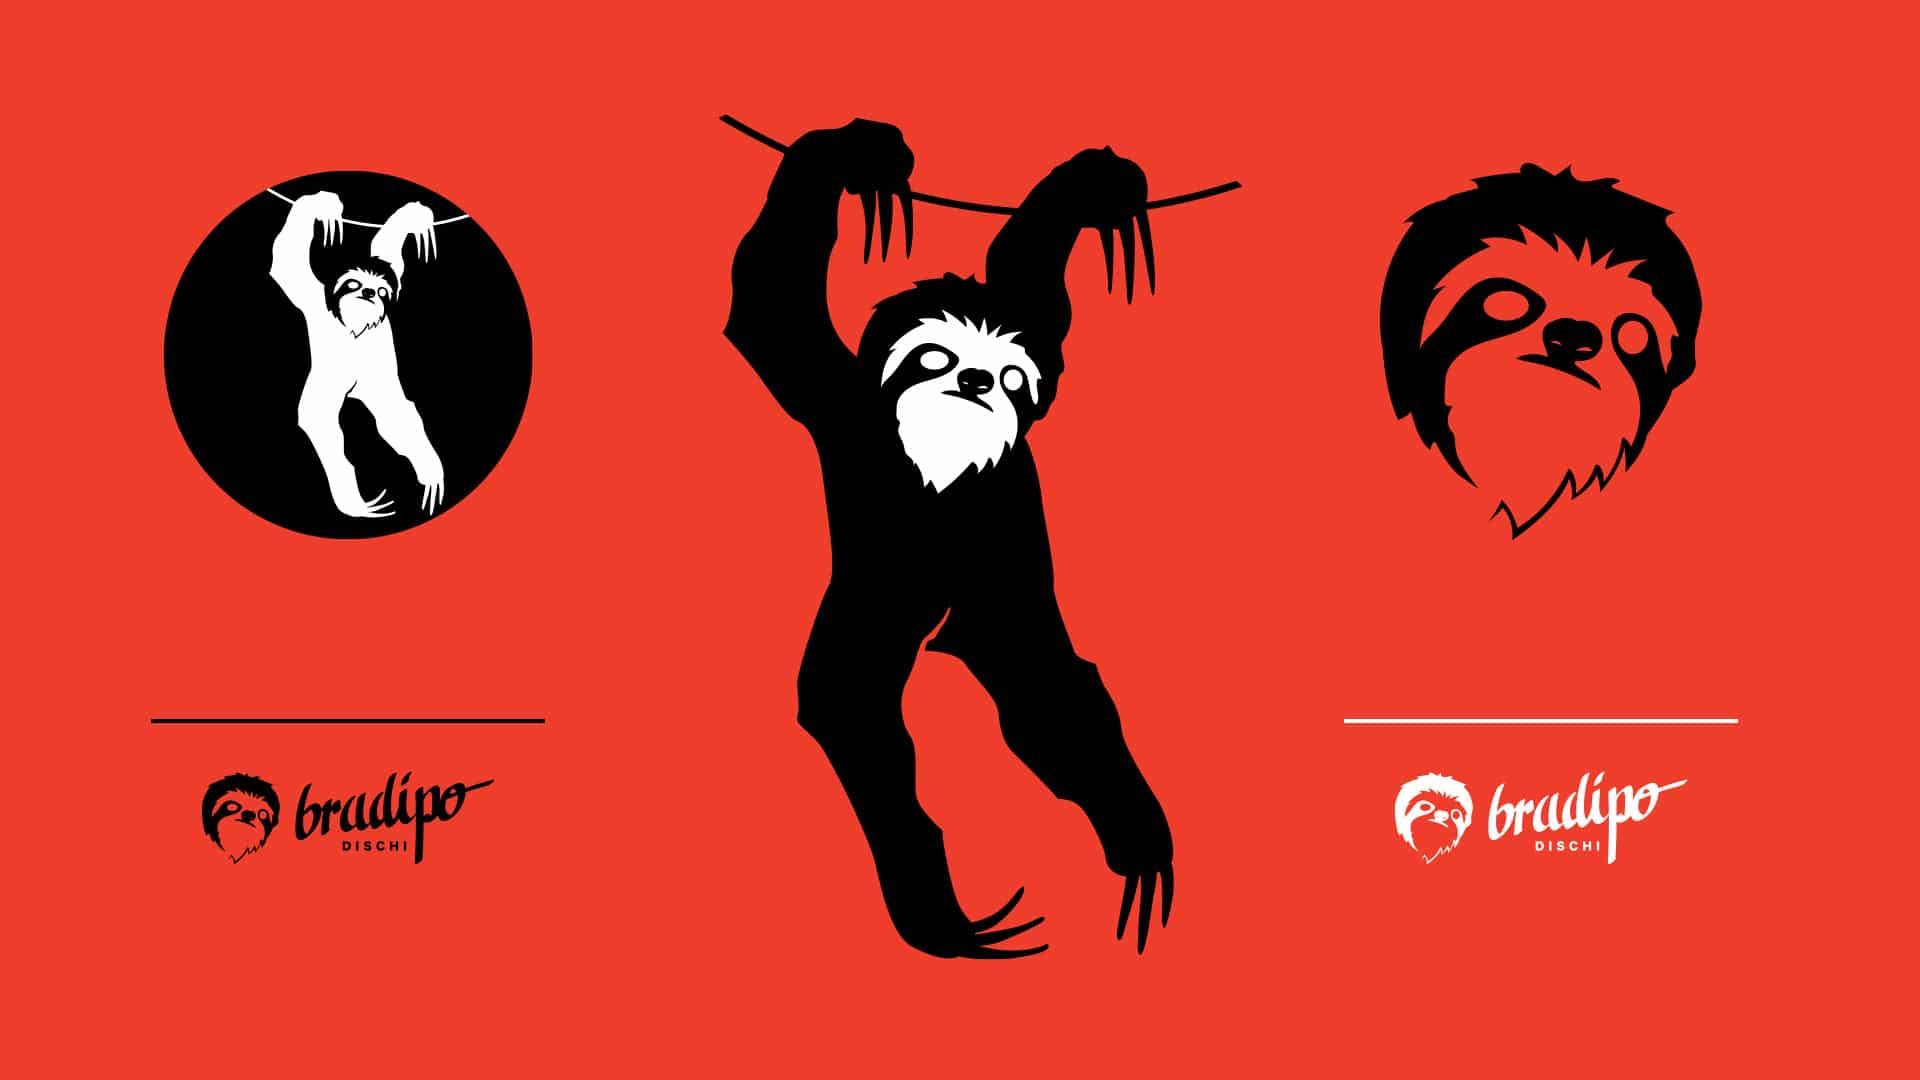 12 grafico milano monogram bradipo dischi